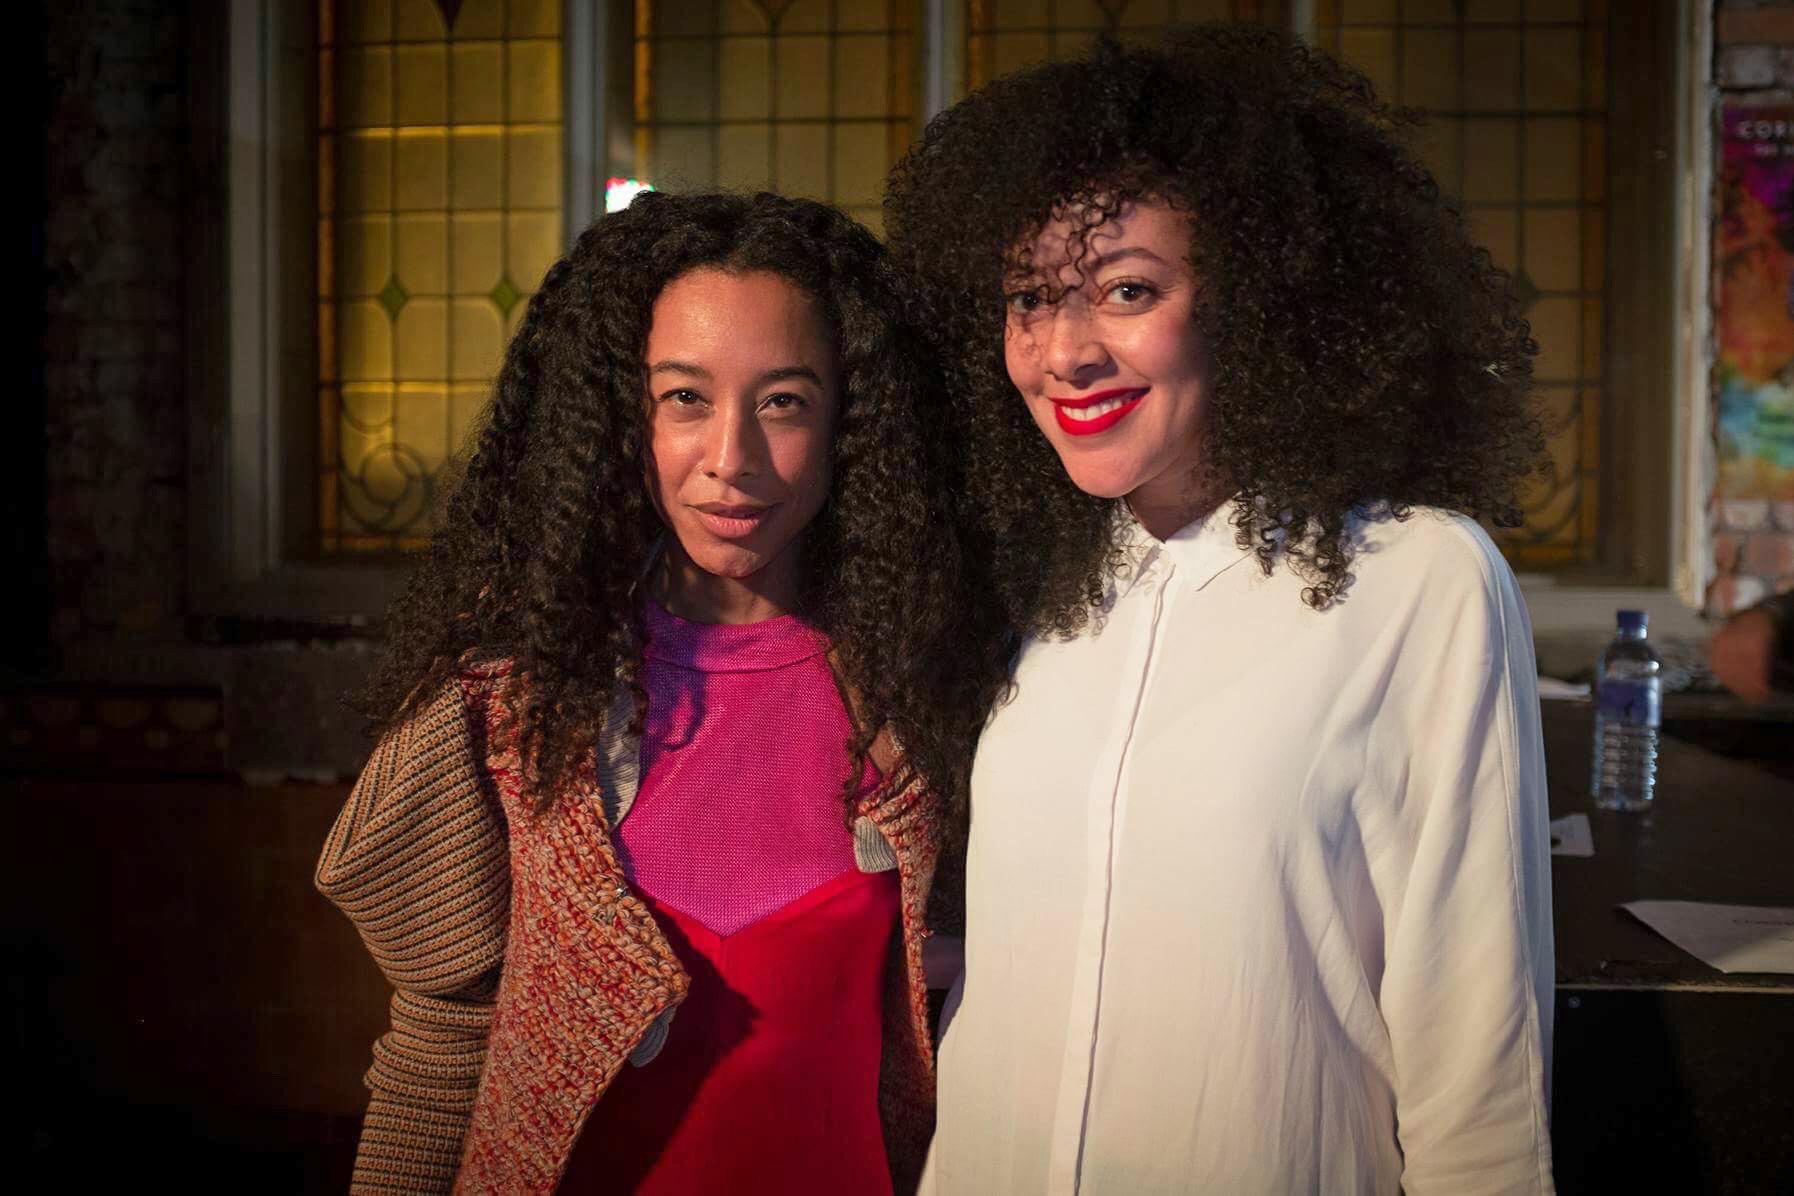 Corinne Bailey Rae and Lynda Moyo